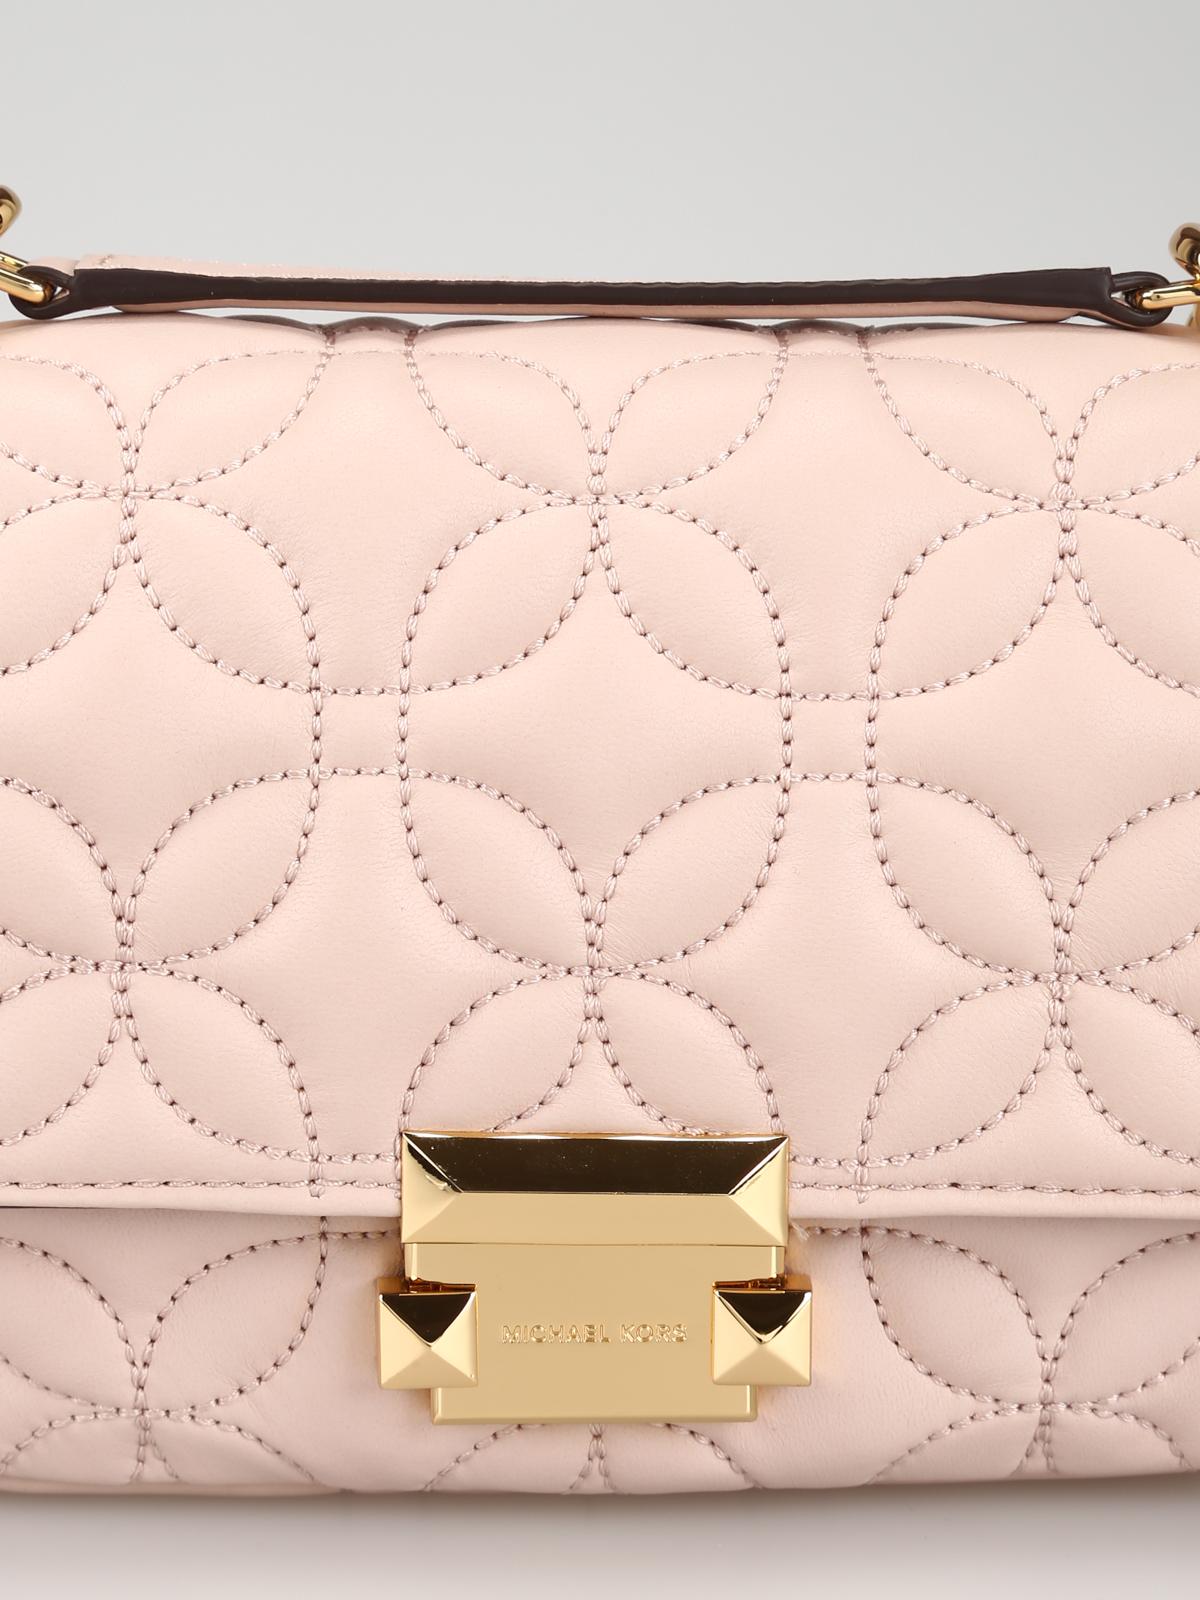 732feaa6a5a6 Sloan soft pink matelassé leather small bag shop online: MICHAEL KORS